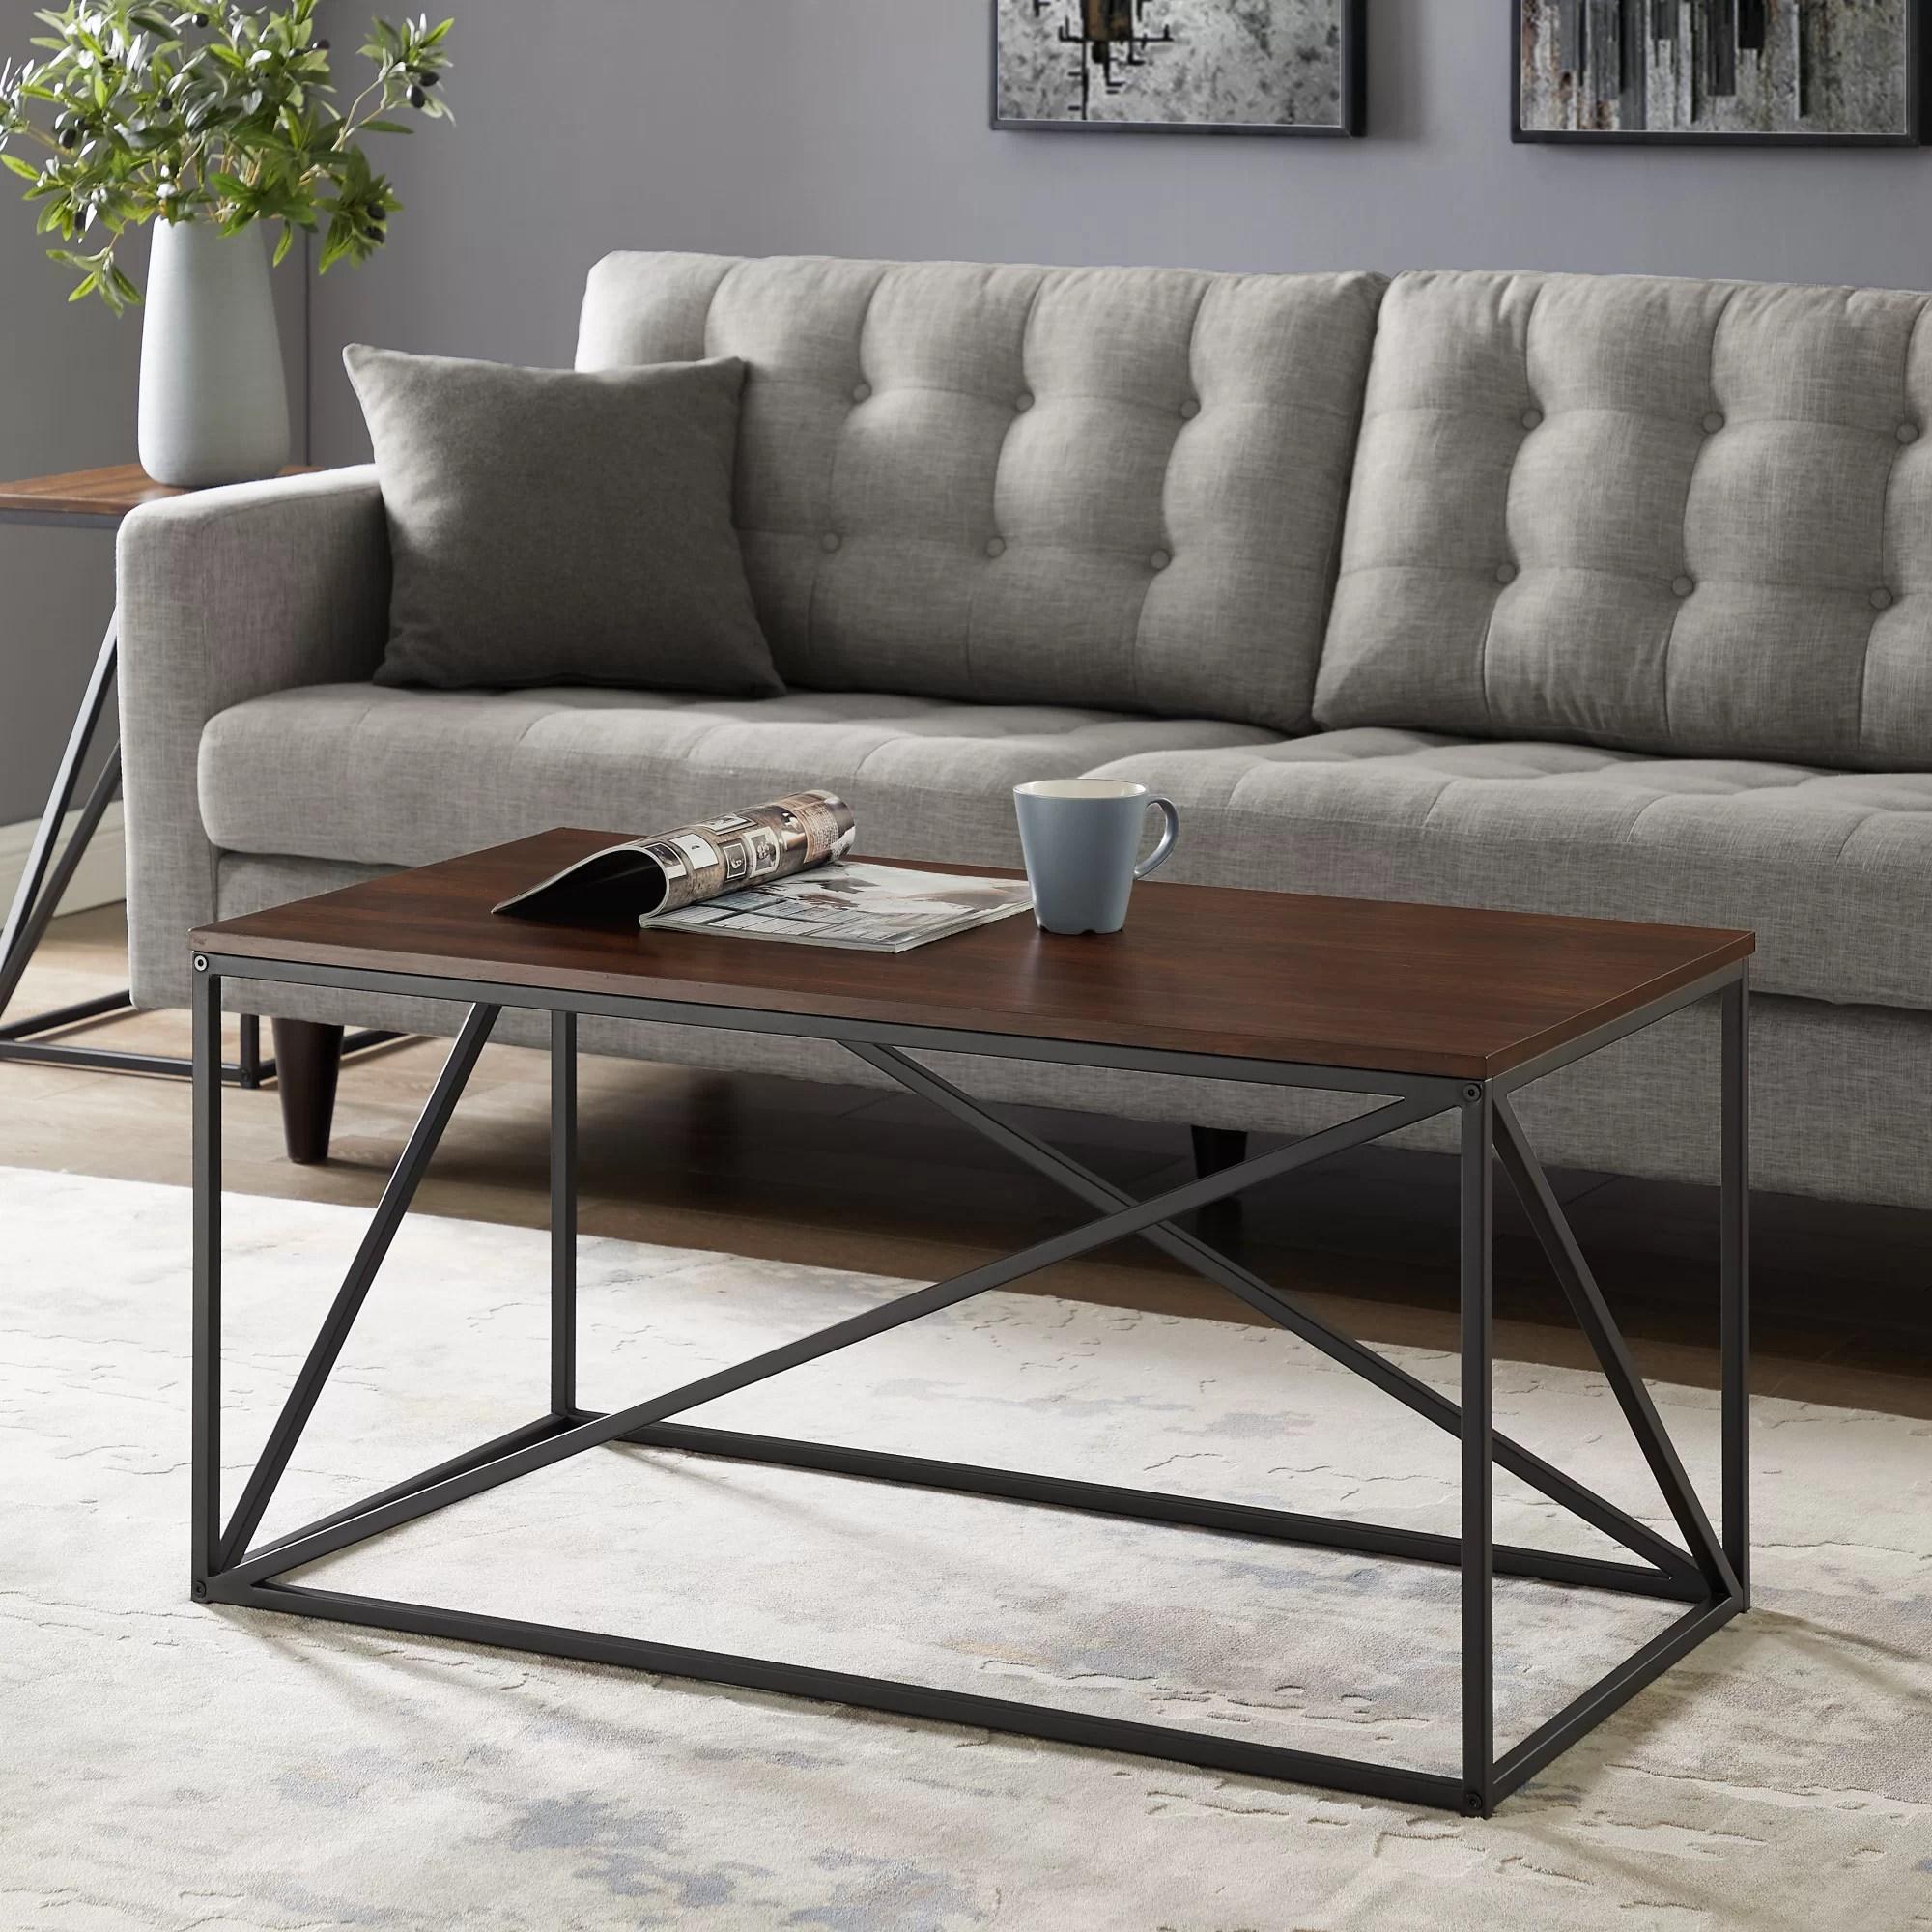 17 Stories Ziegler Frame Coffee Table Reviews Wayfair